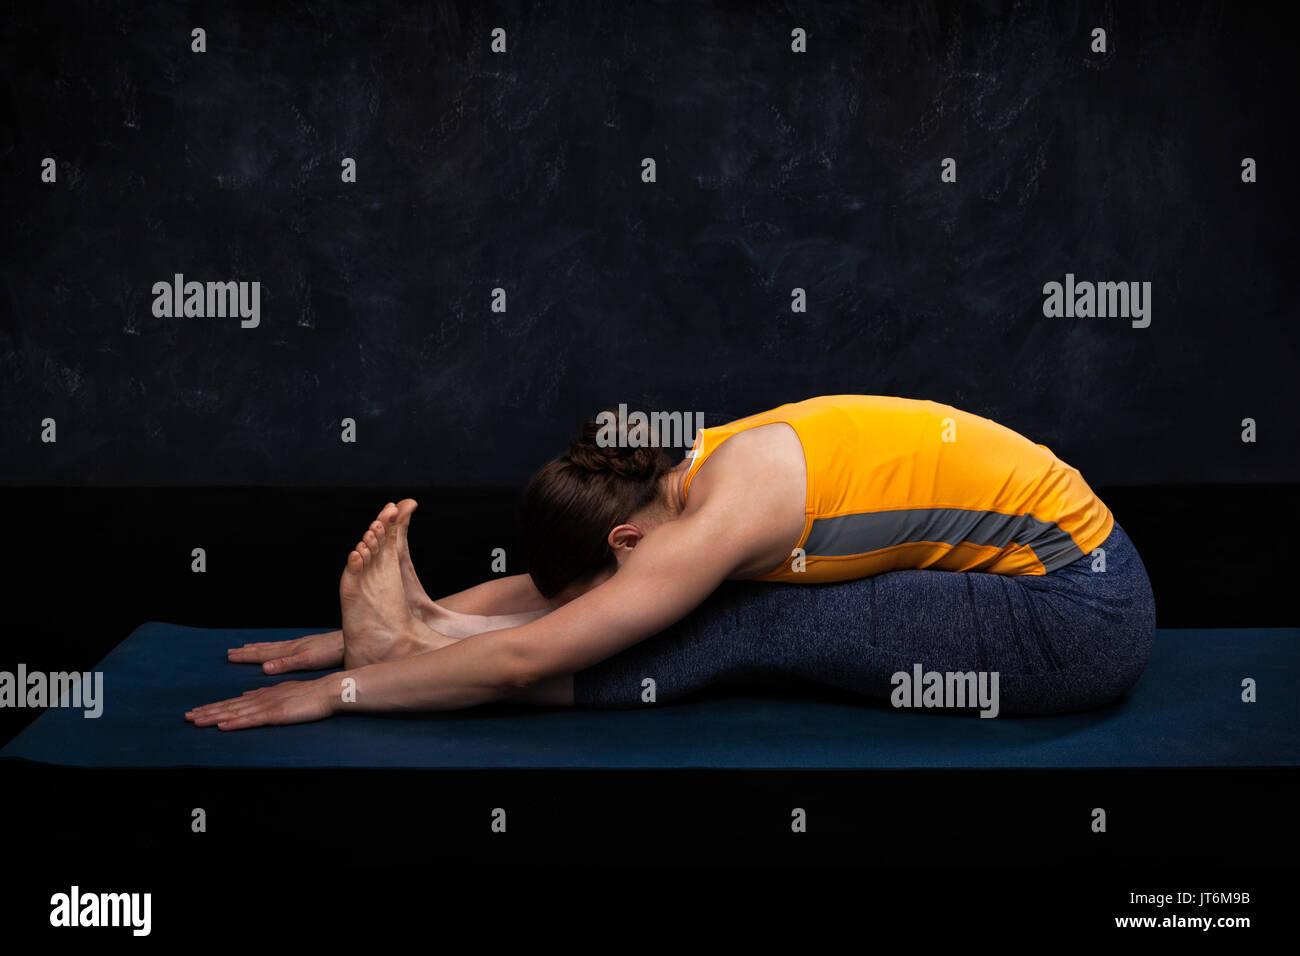 Woman practices Ashtanga Vinyasa yoga asana Paschimottanasana - Stock Image